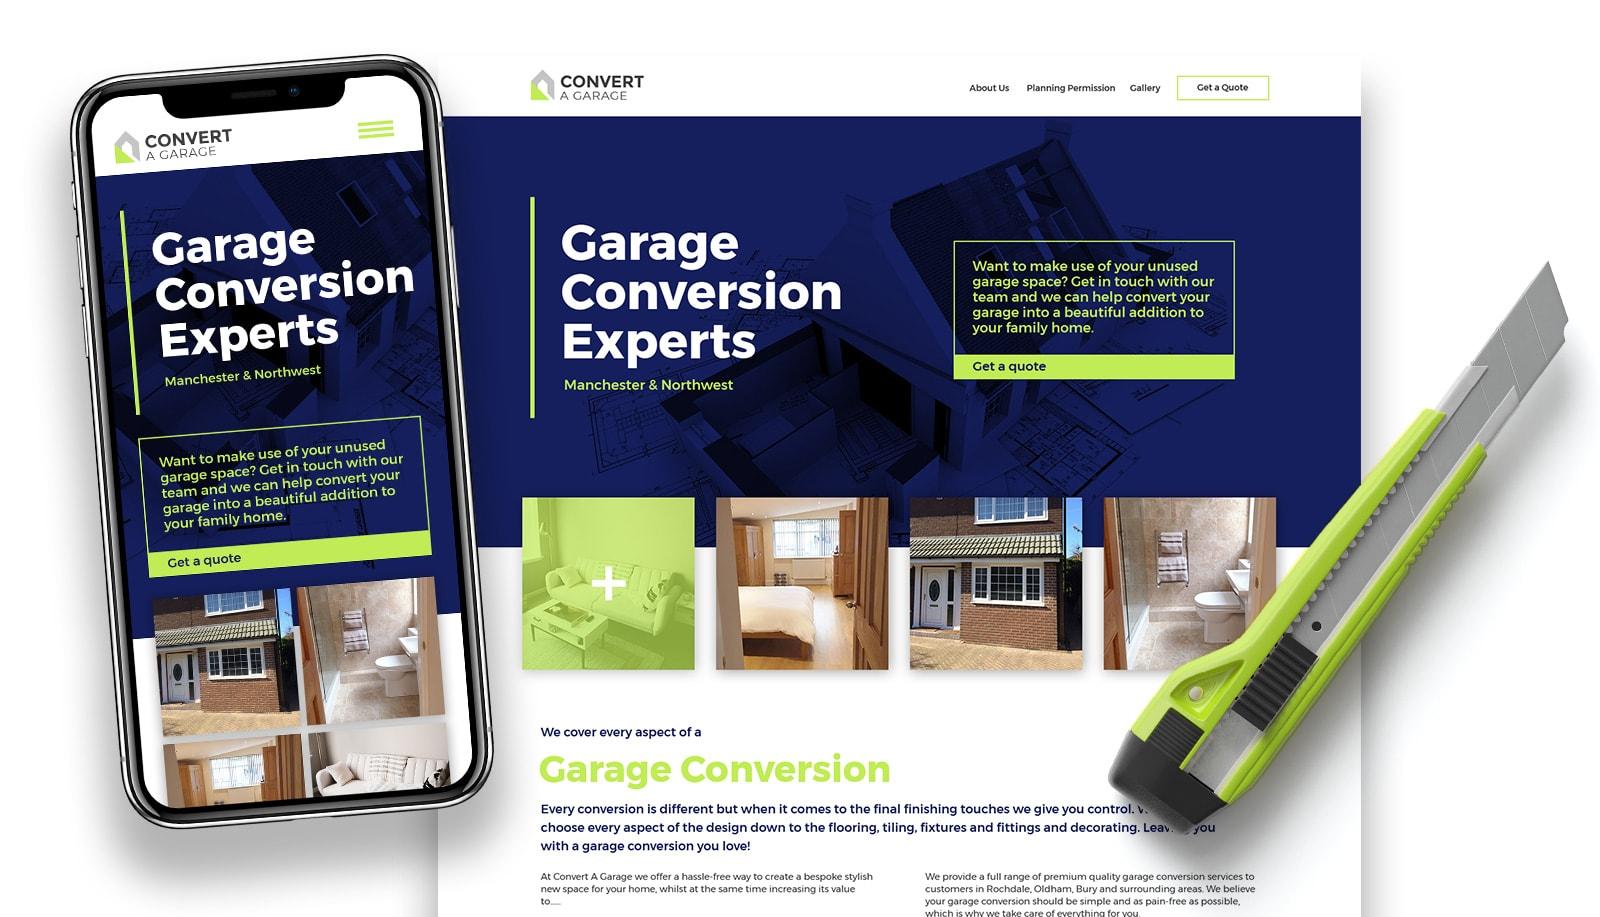 Convert A Garage responsive website design and branding